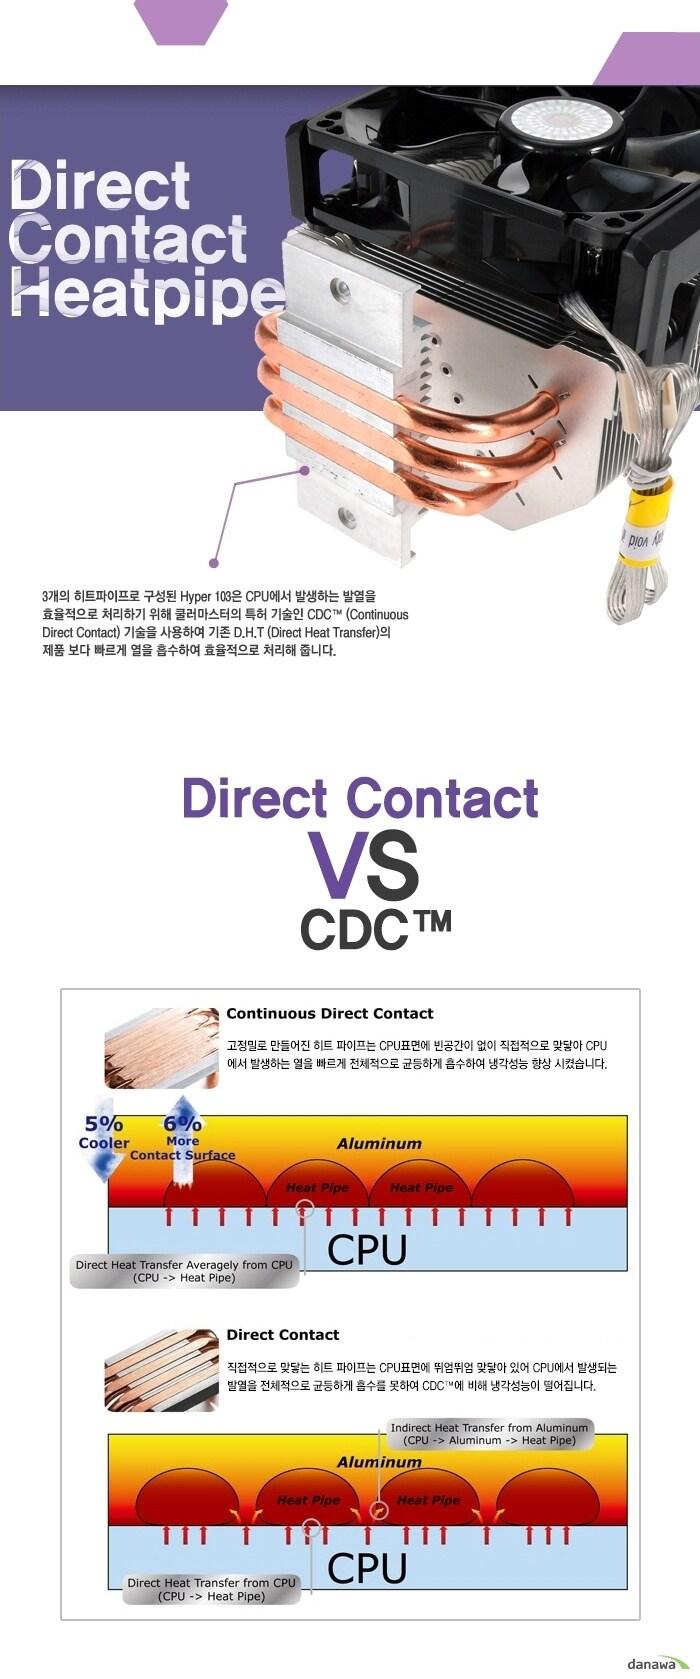 Direct Contact Heatpipe 3개의 히트파이프로 구성된 Hyper 103은 CPU에서 발생하는 발열을 효율적으로 처리하기 위해 쿨러마스터의 특허 기술인 CDC (Continuous Direct Contact) 기술을 사용하여 기존 D.H.T (Direct Heat Transfer)의 제품보다 빠르게 열을 흡수하여 효율적으로 처리해 줍니다. Direct Contact VS CDC